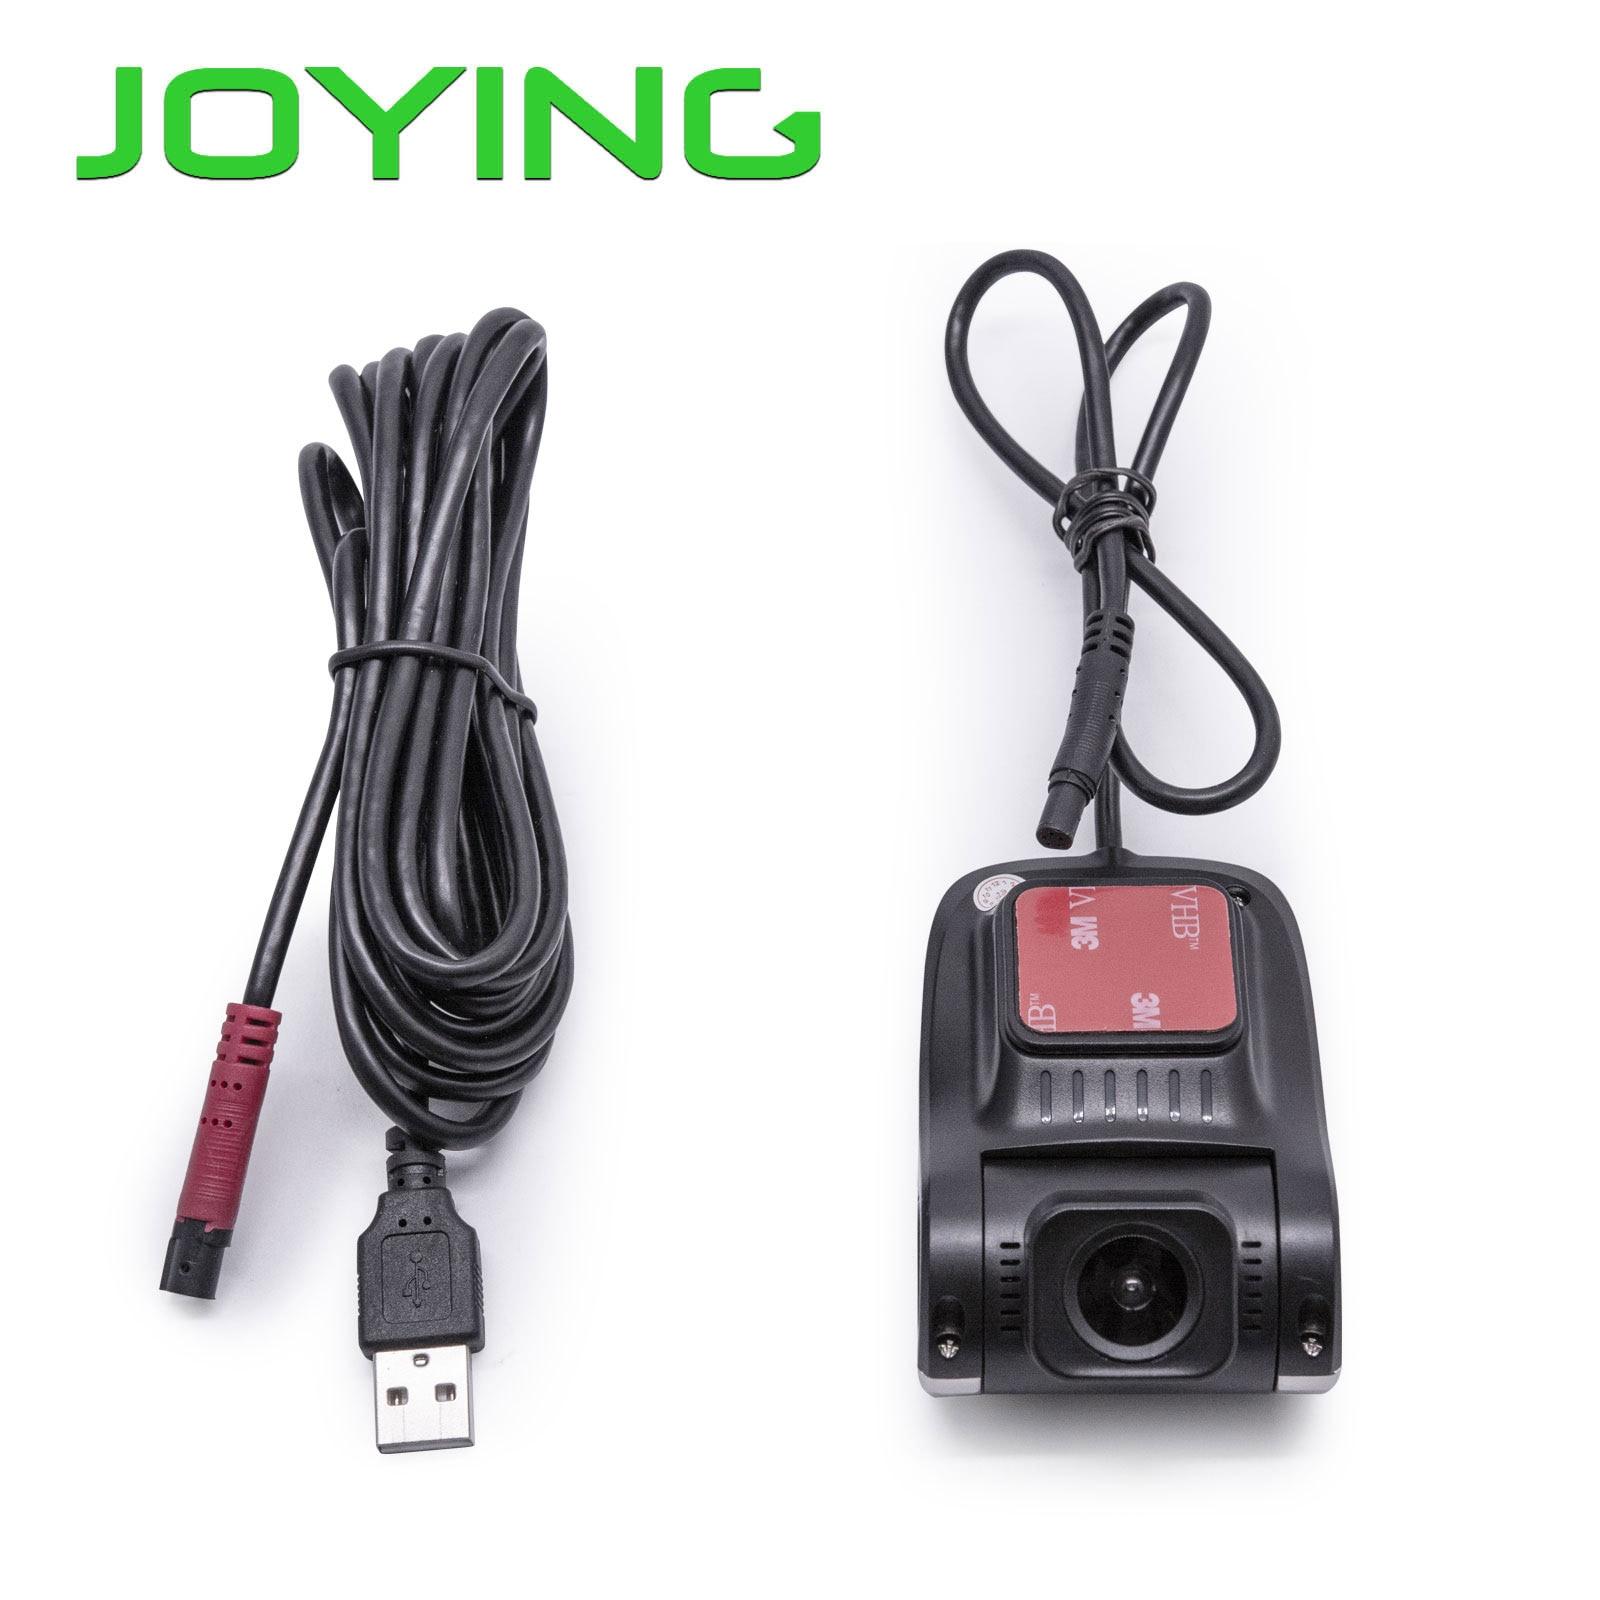 New Joying Dash Cam Full HD Video Registrator Recorder Car Camera Auto DVR for Android System Car Radio multimedia player|DVR/Dash Camera| |  - title=